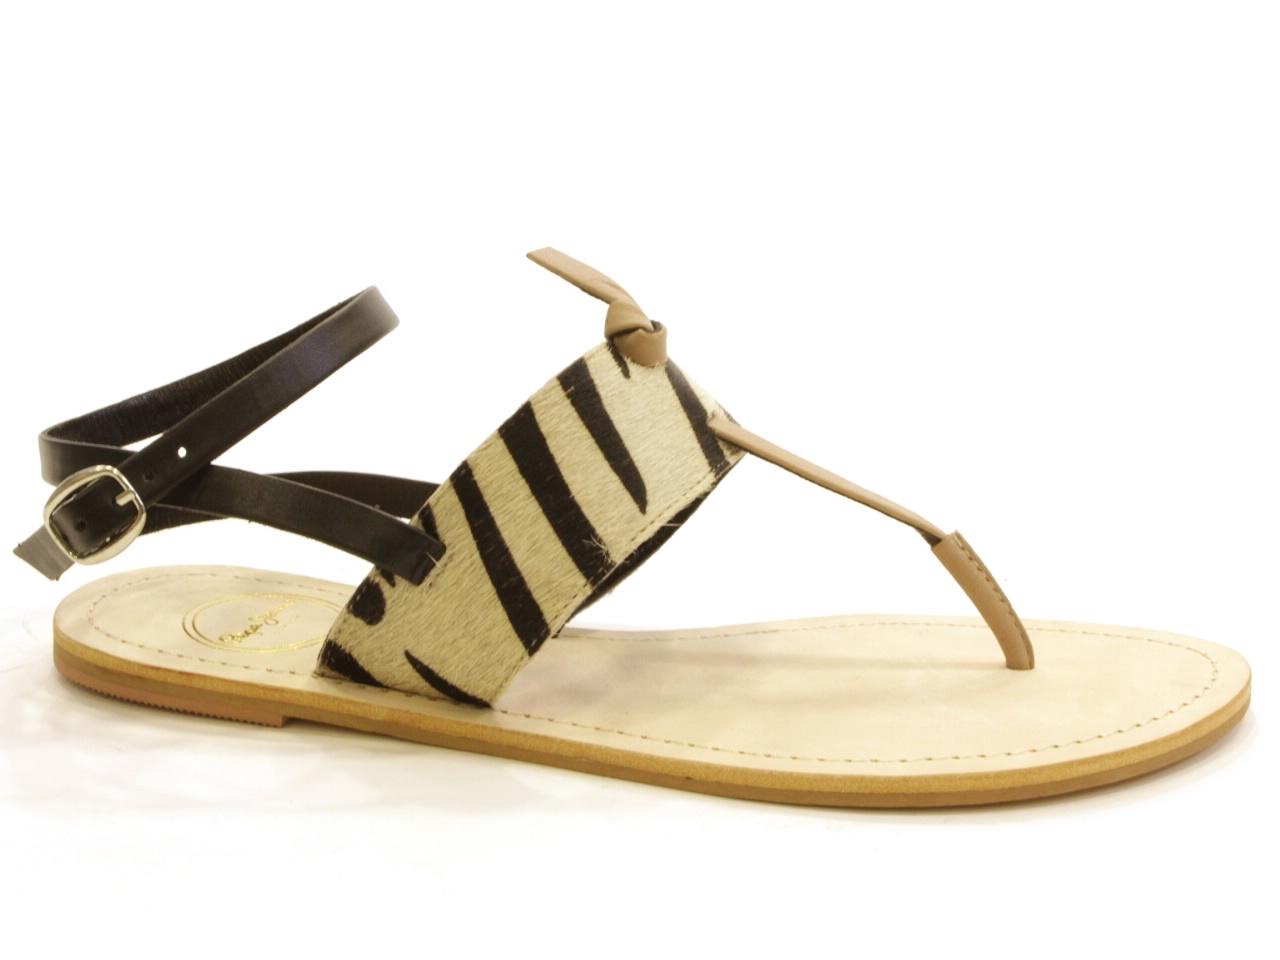 Sandálias Baixas Pepe Jeans - 608 BAS-291